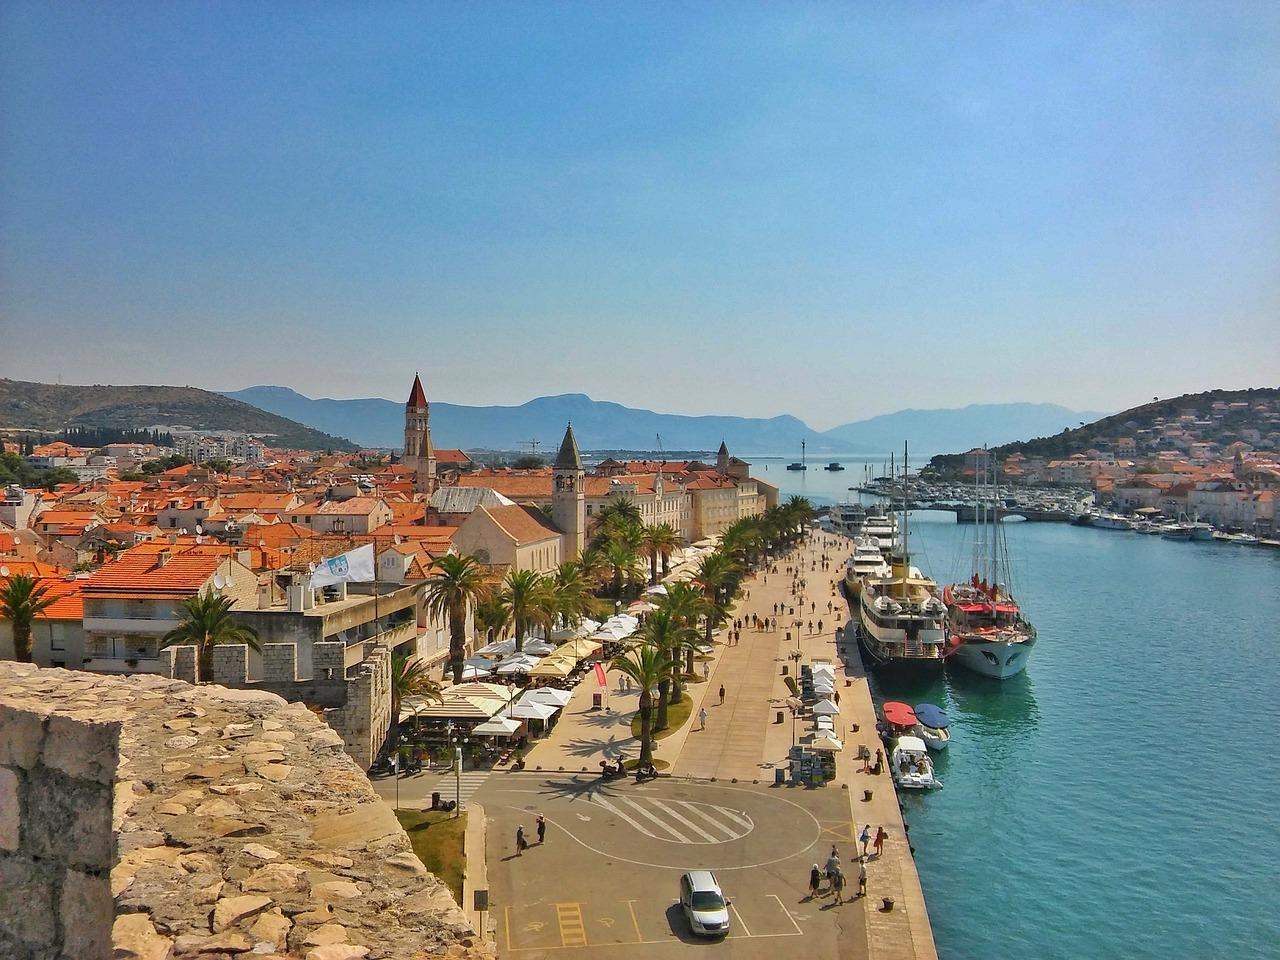 Trogir oldtown and waterfront promenade